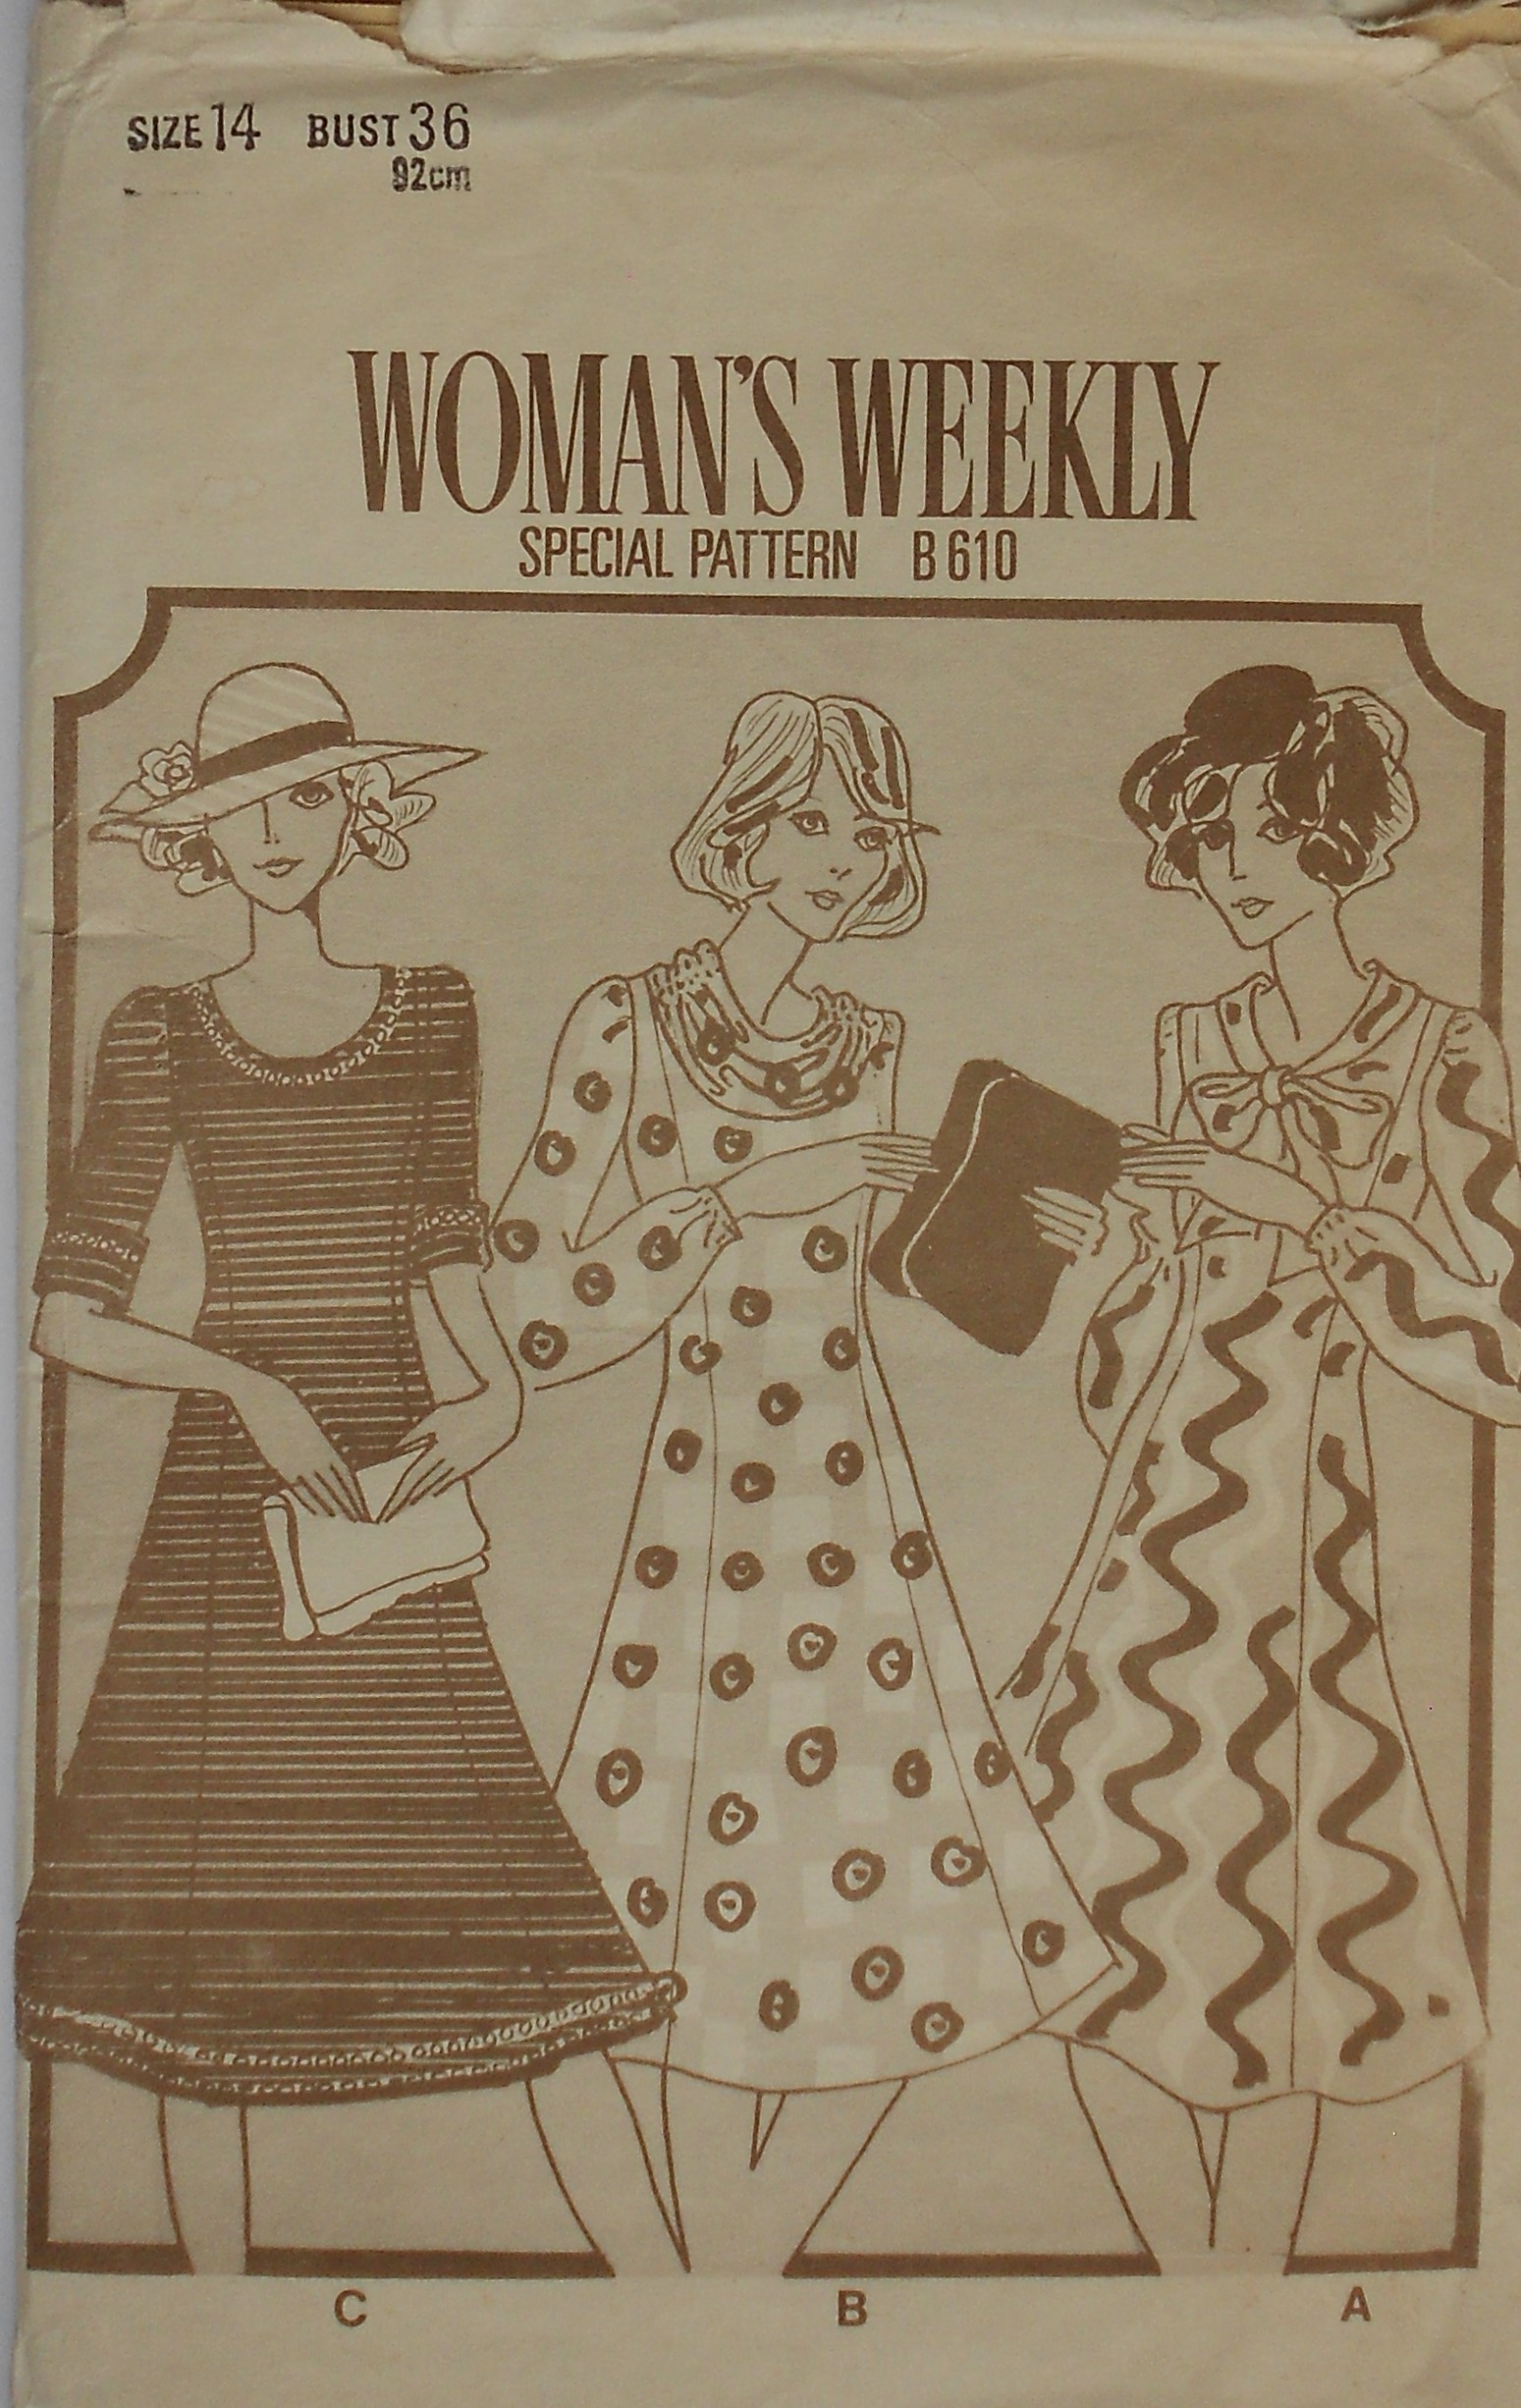 Woman's Weekly B610